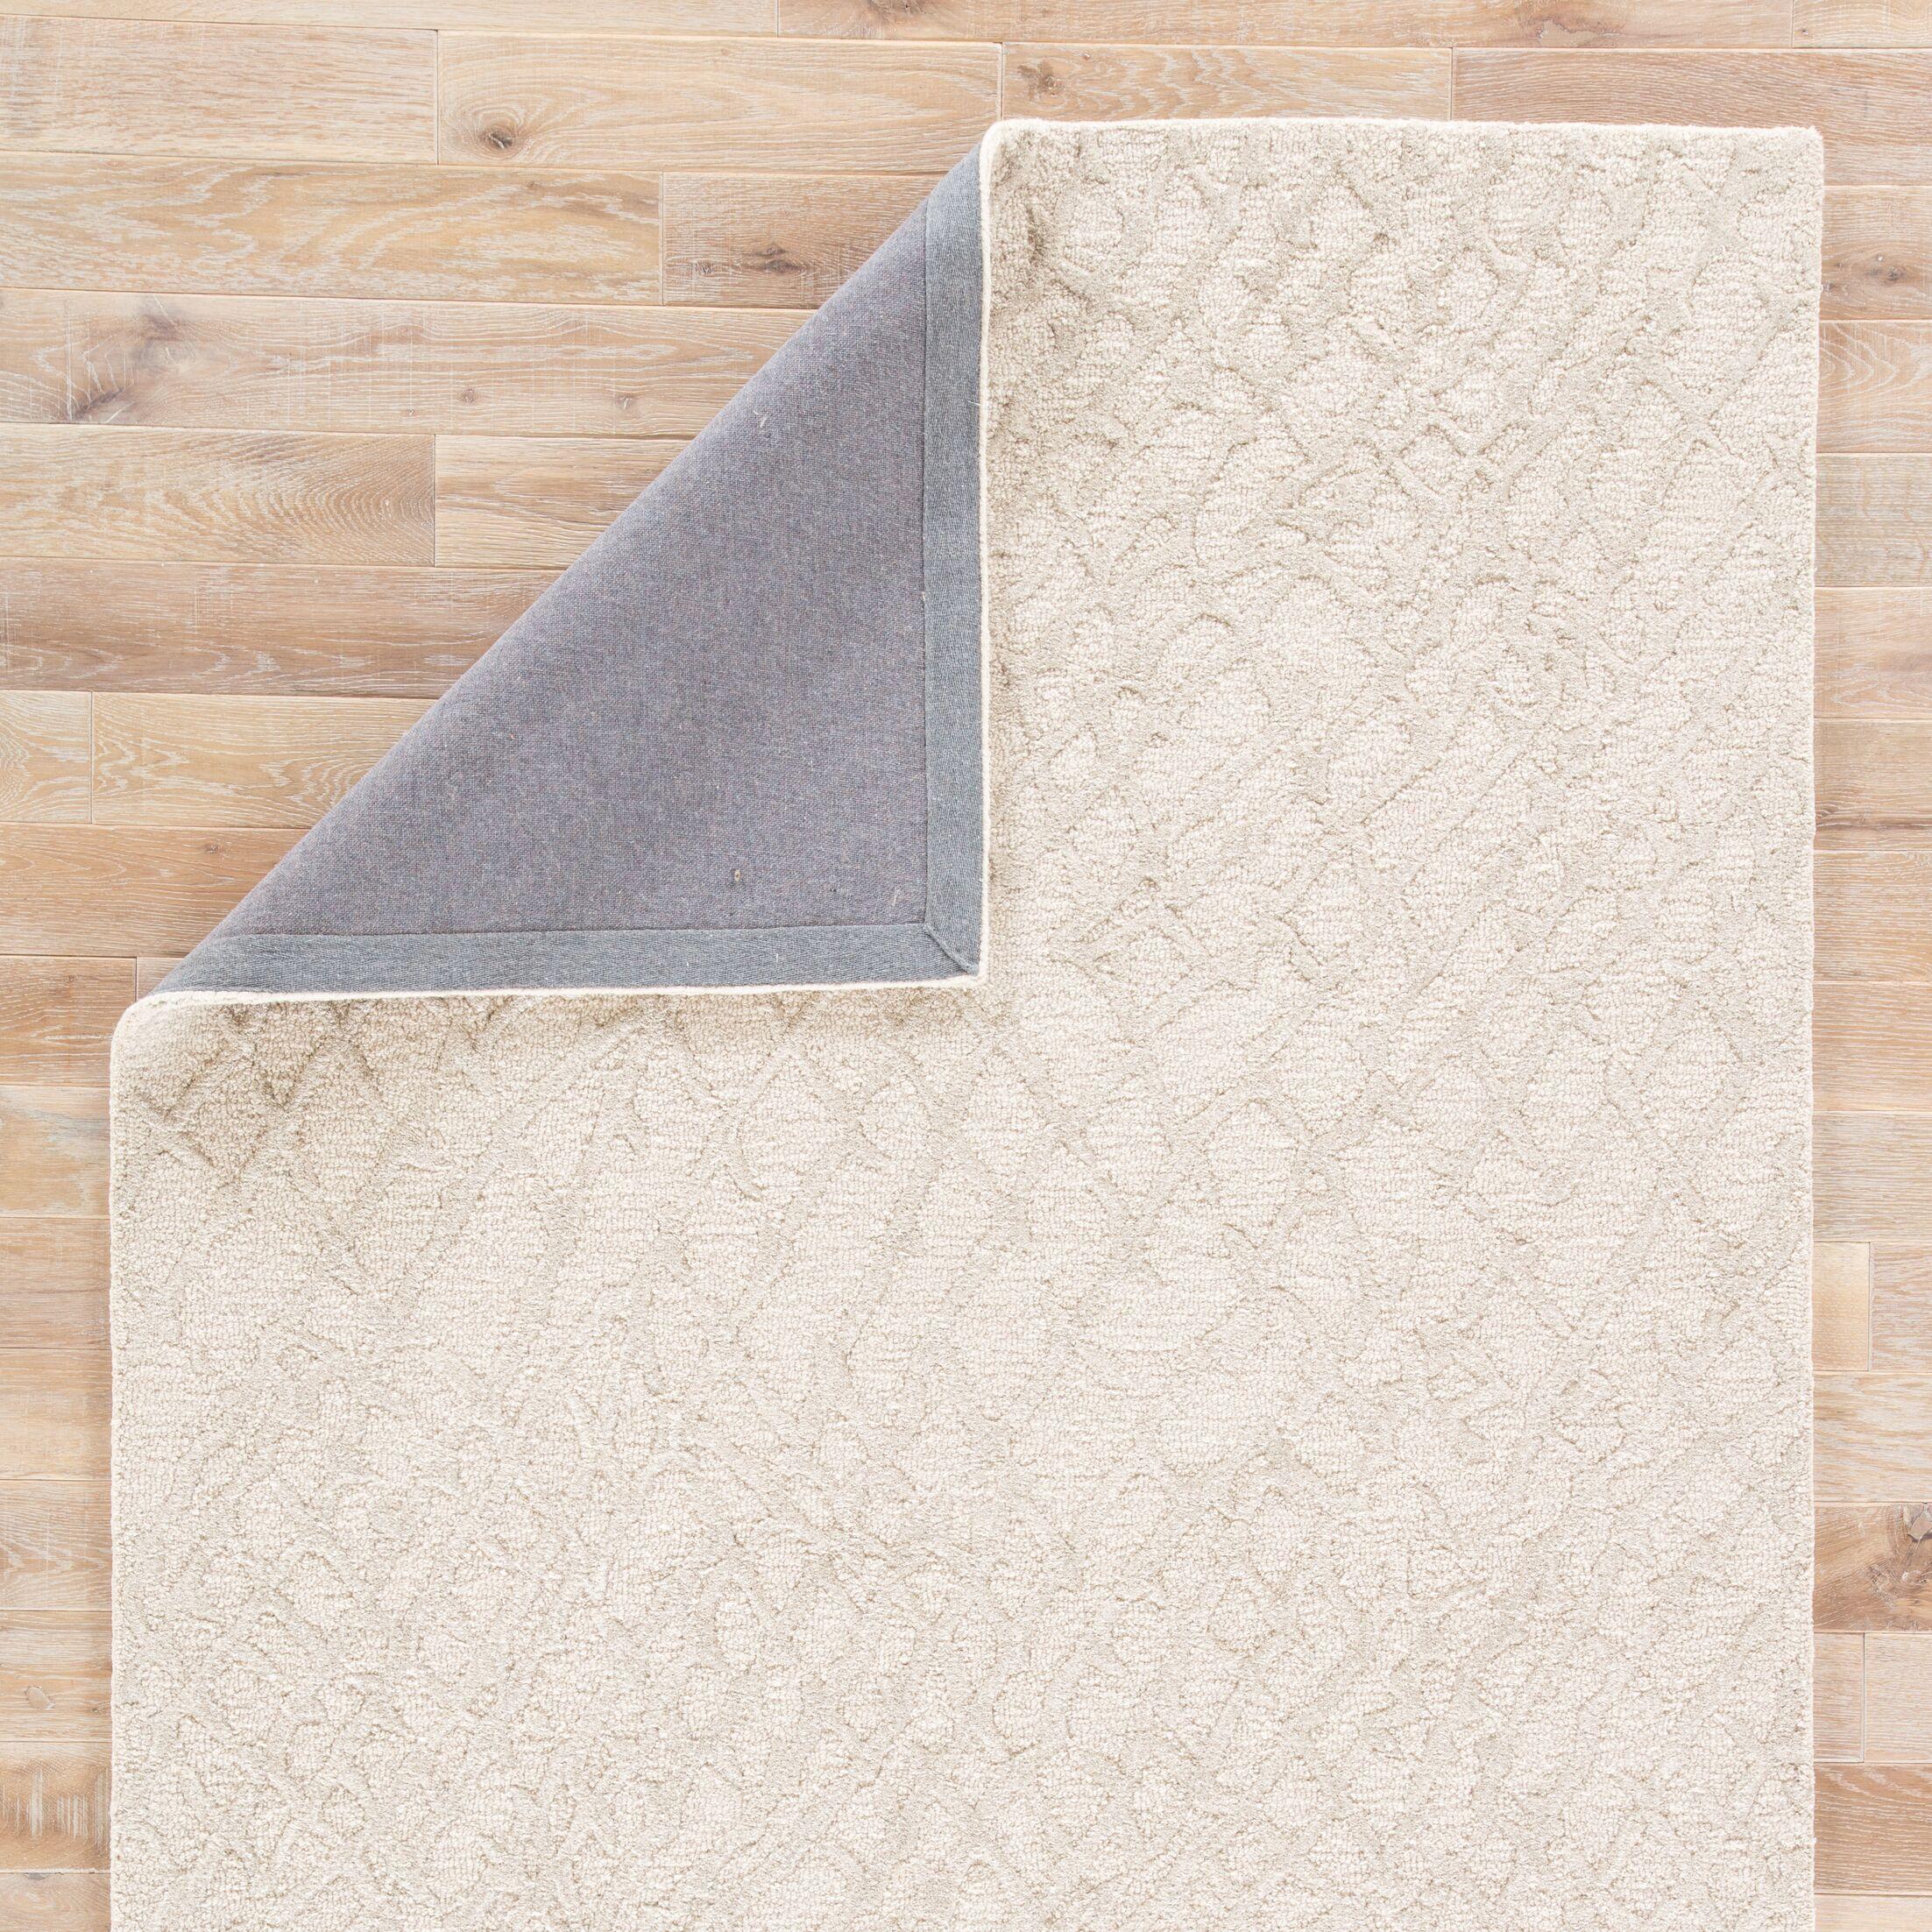 Elyse Wool Ivory/Gray Area Rug Rug Size: 2' x 3'